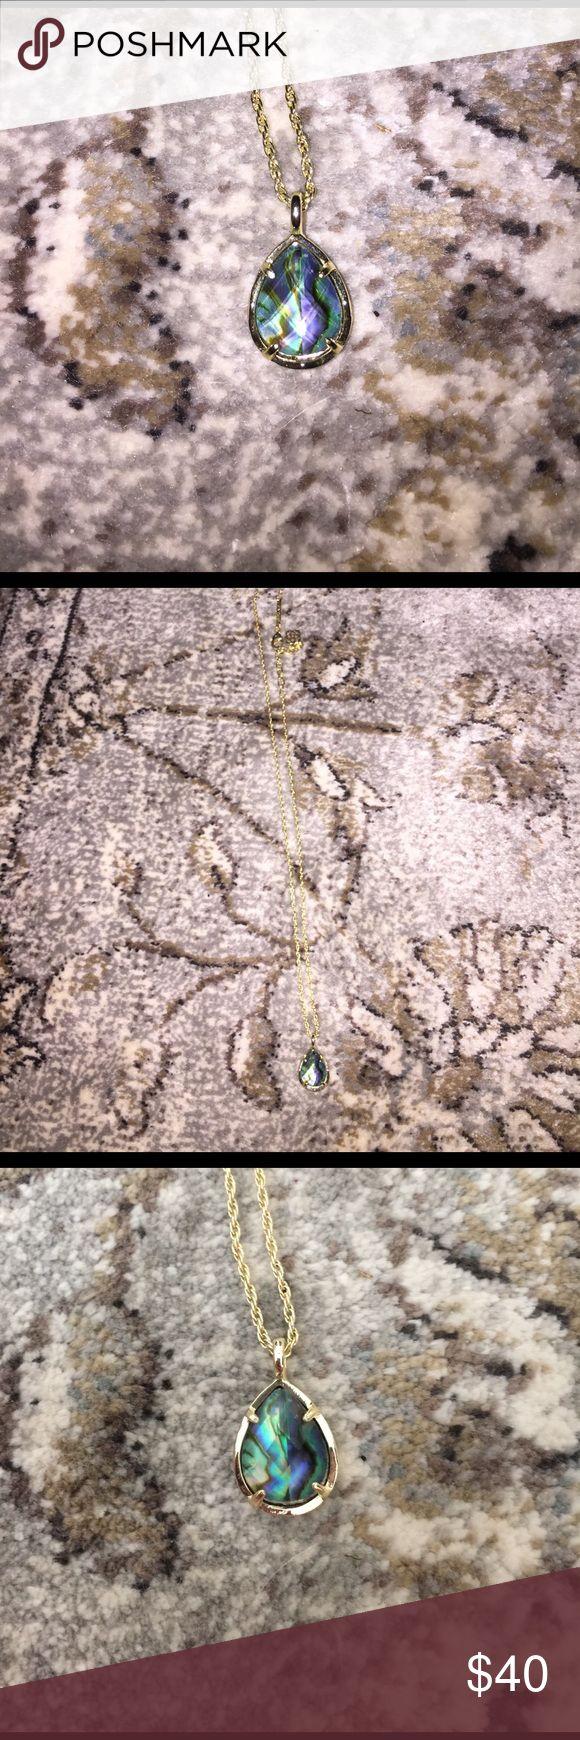 Kendra Scott Abalone & Gold Necklace Kendra Scott Abalone & Gold Necklace Kendra Scott Jewelry Necklaces